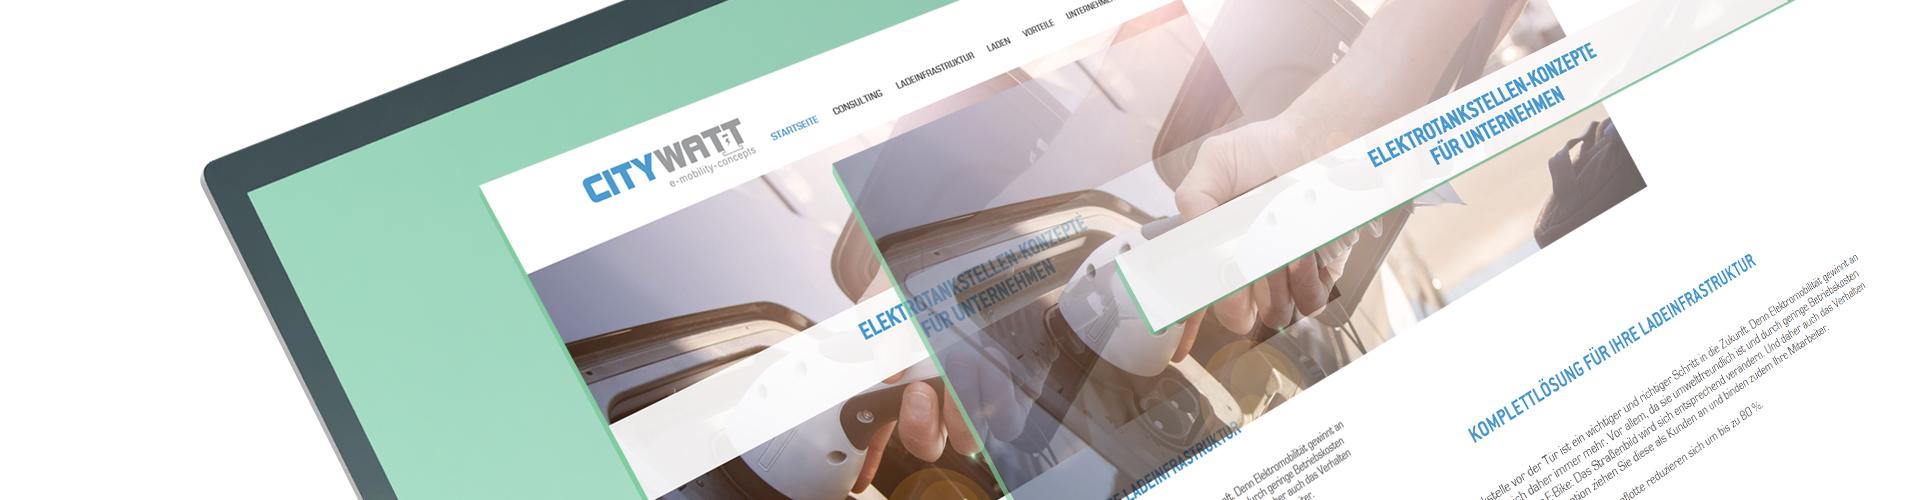 CITYWATT GmbH I Webseite I Online